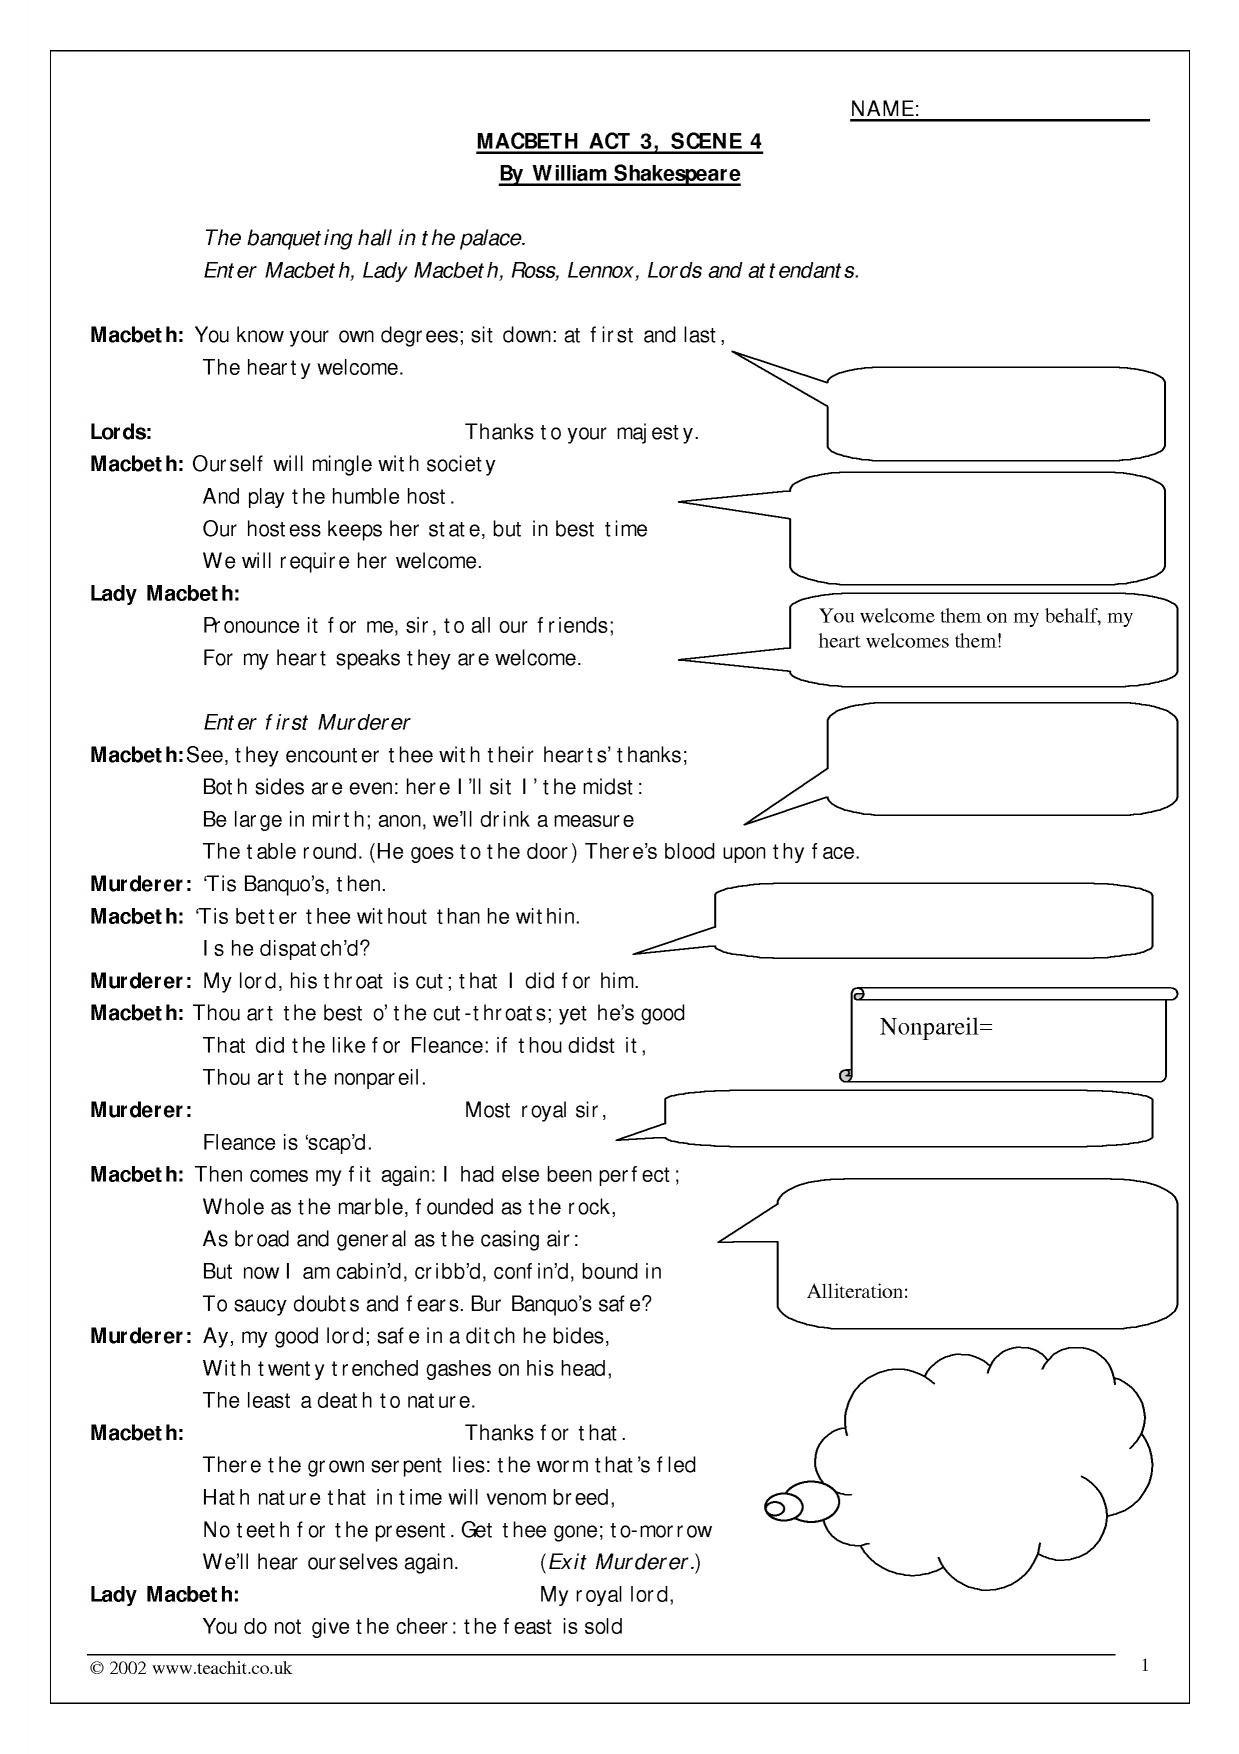 Annotatable Act 3 Scene 4 Inside Macbeth Act 3 Vocabulary Worksheet